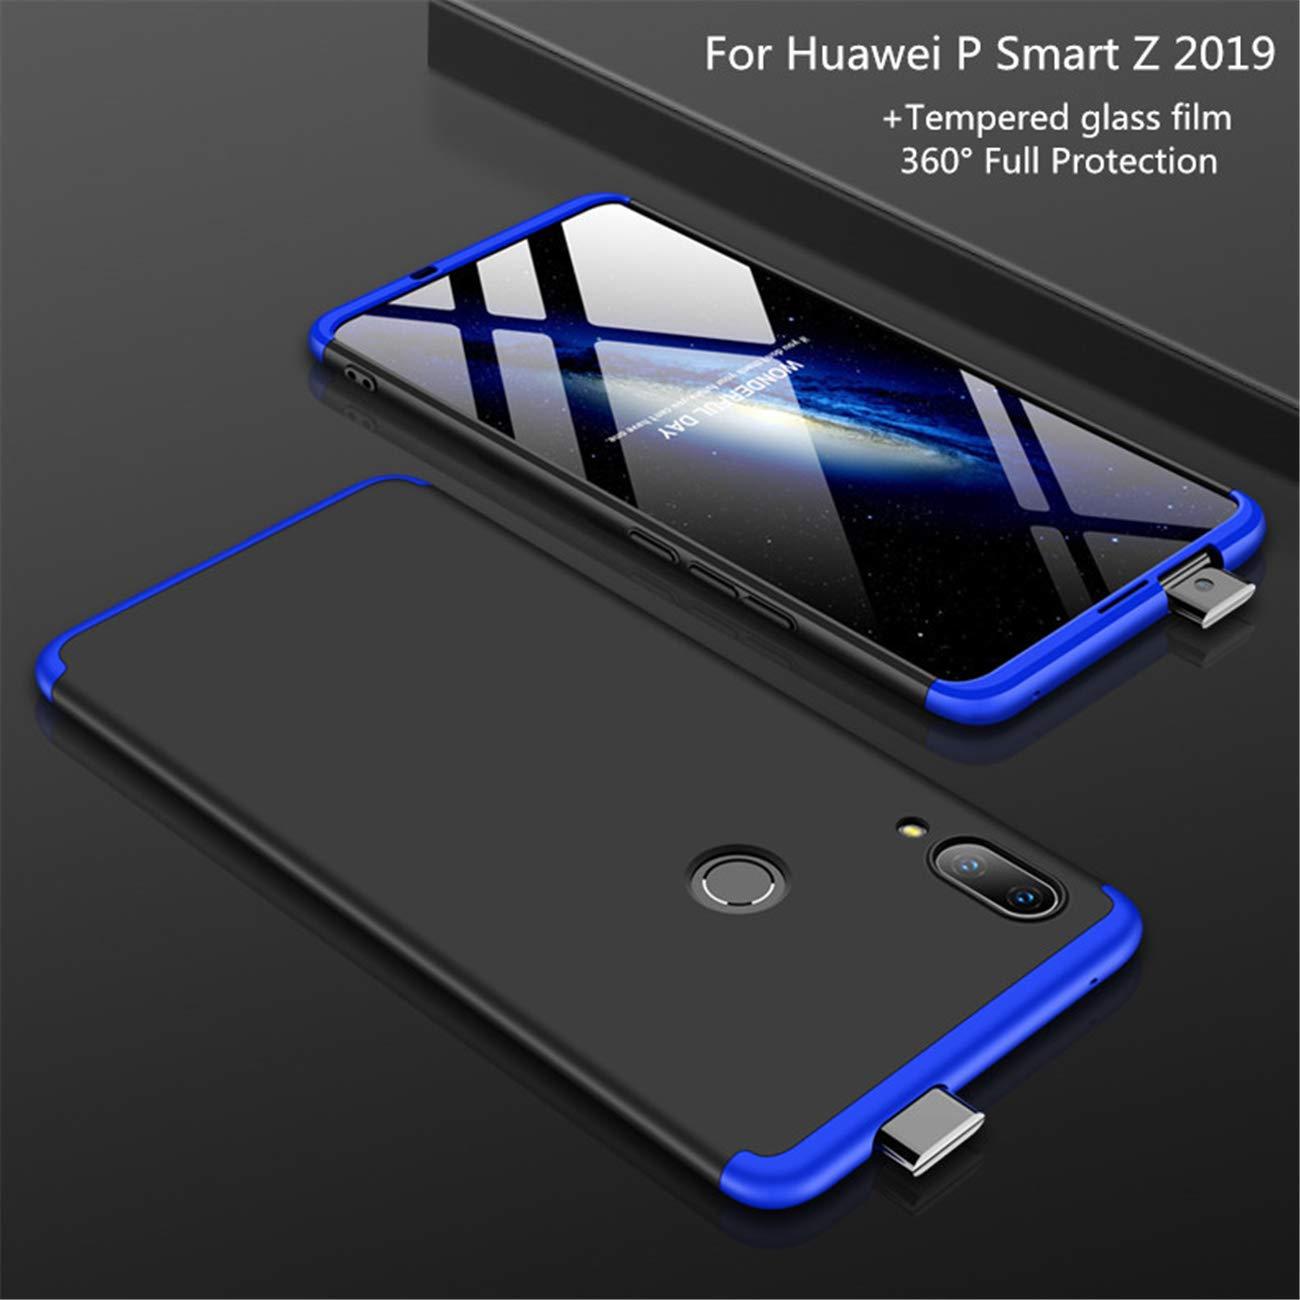 Cristal Templado Matte Ultra Slim PC Hard-Protecci/ón del Cuerpo Scratchproof Cubierta-Azul+Negro DECHYI compatibles para Funda Huawei P Smart Z,Cubierta